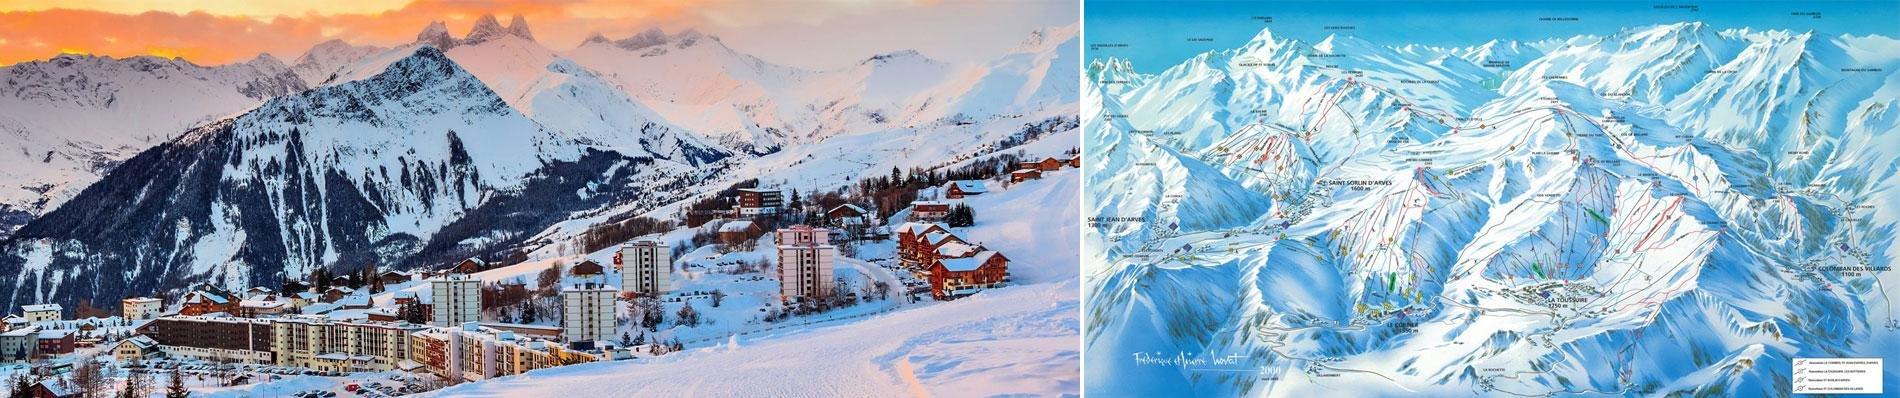 cgh alpaga la toussuire les sybelles wintersport ski frankrijk